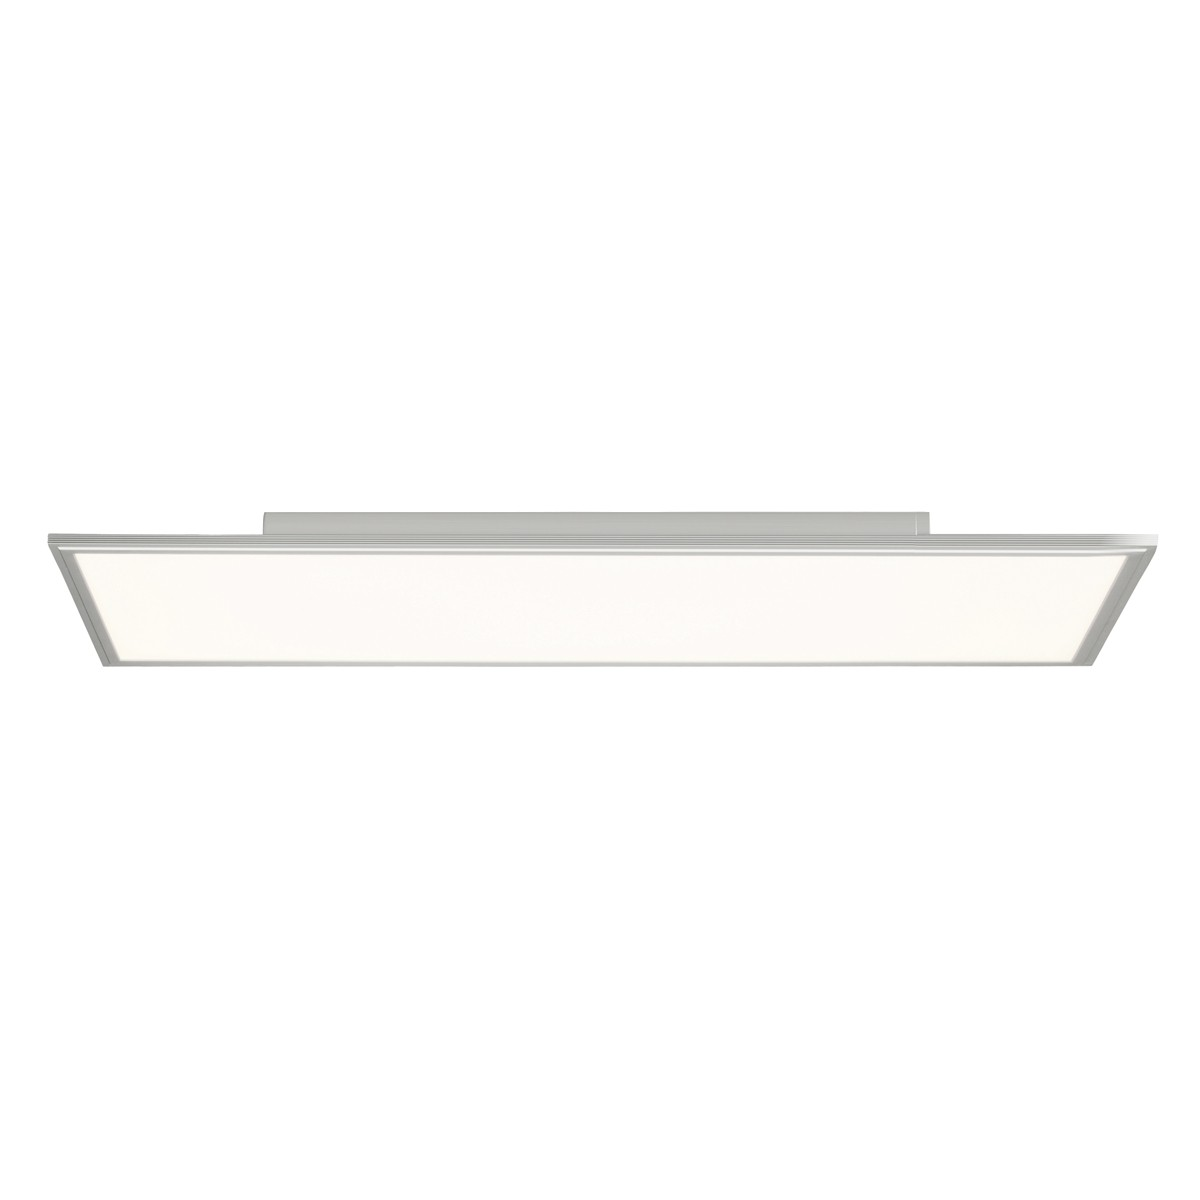 Brilliant Flat Deckenleuchte, rechteckig, Aluminium